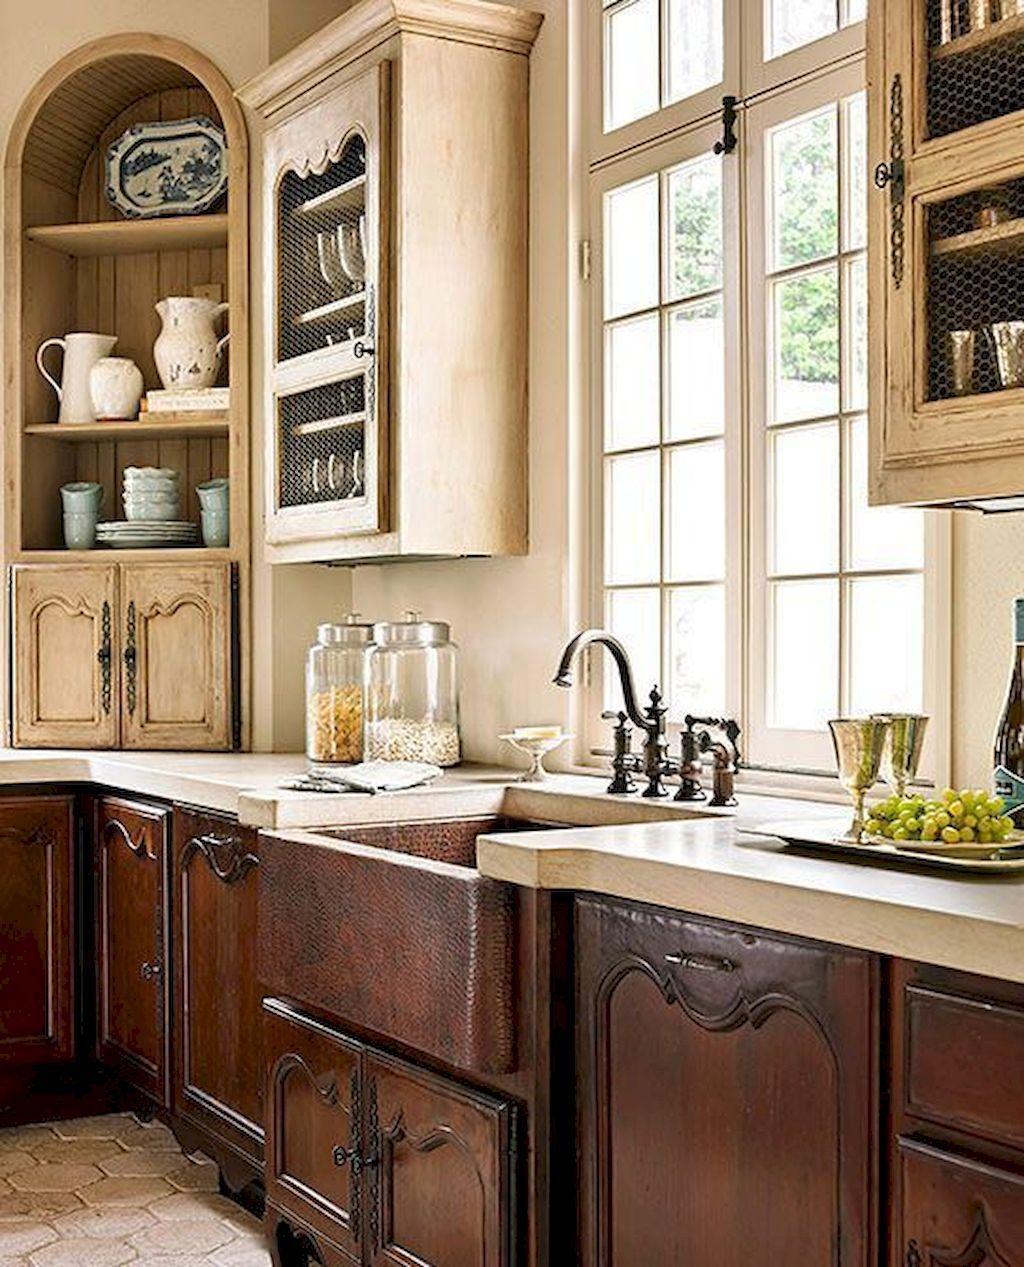 113 modern rustic farmhouse kitchen cabinets ideas french country kitchens french kitchen on farmhouse kitchen hutch id=92717